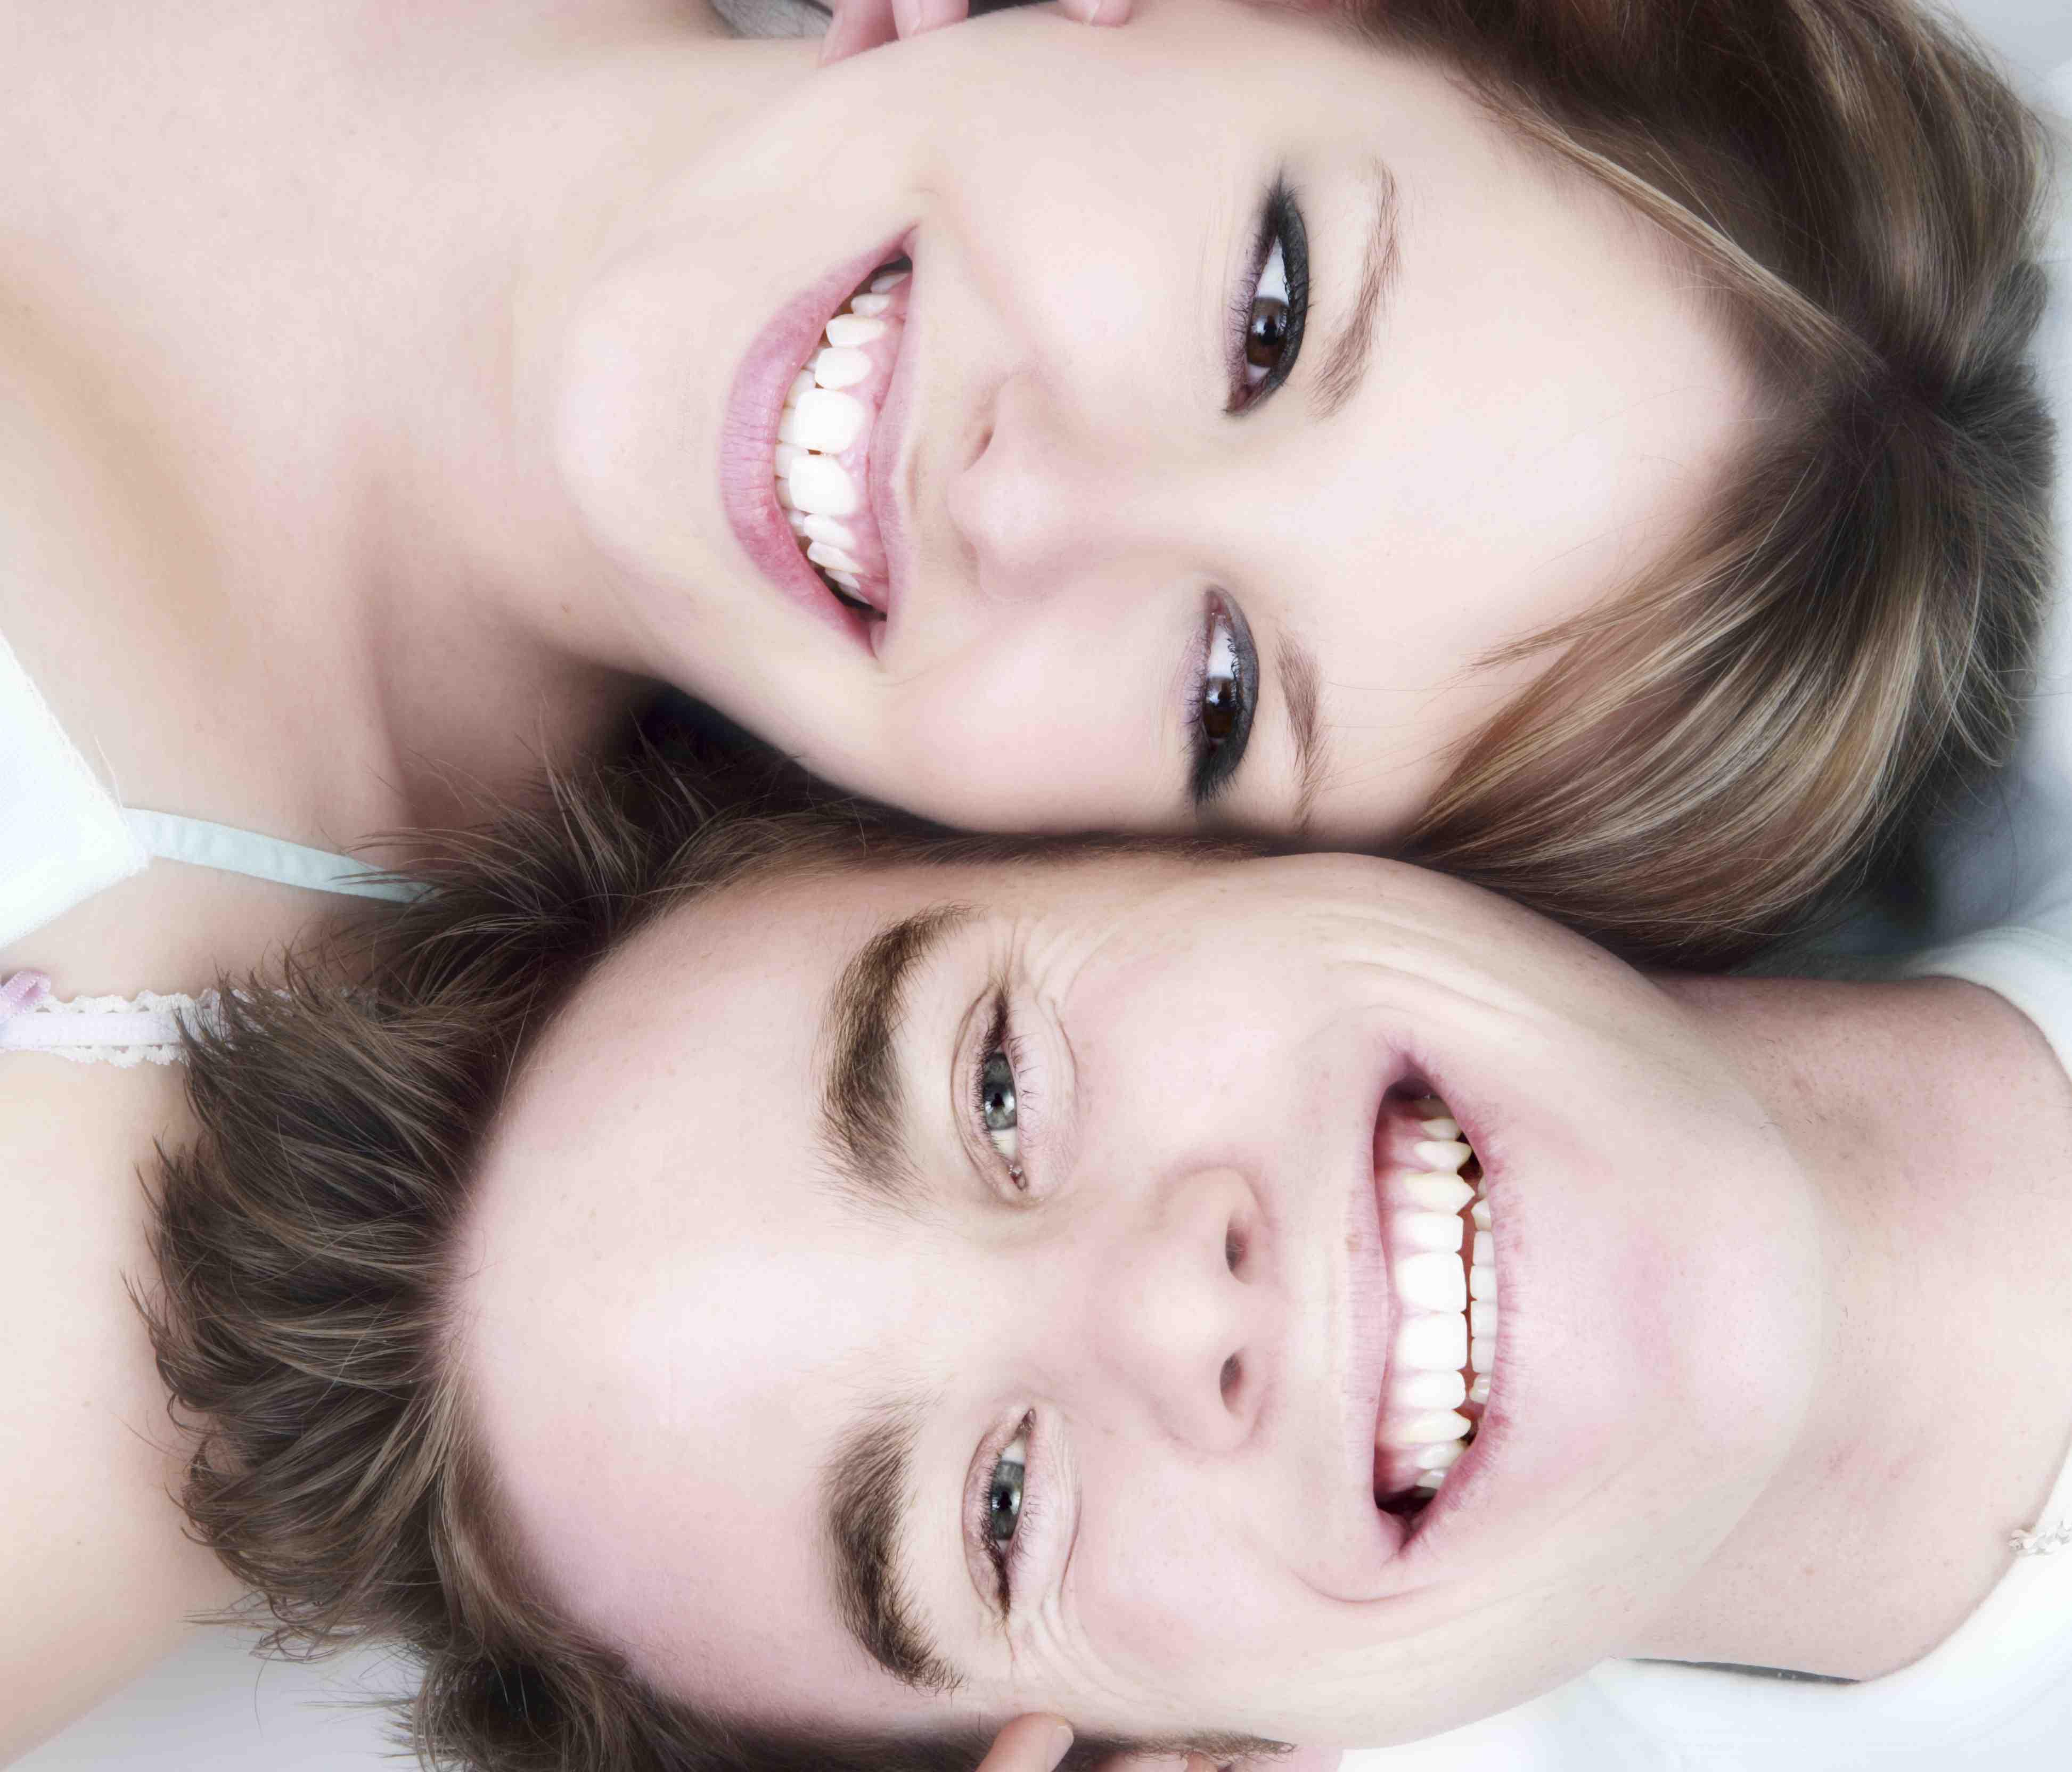 NO GAP Dentists for Medicare's CDBS - Children Dental Benefits Scheme in Melbourne